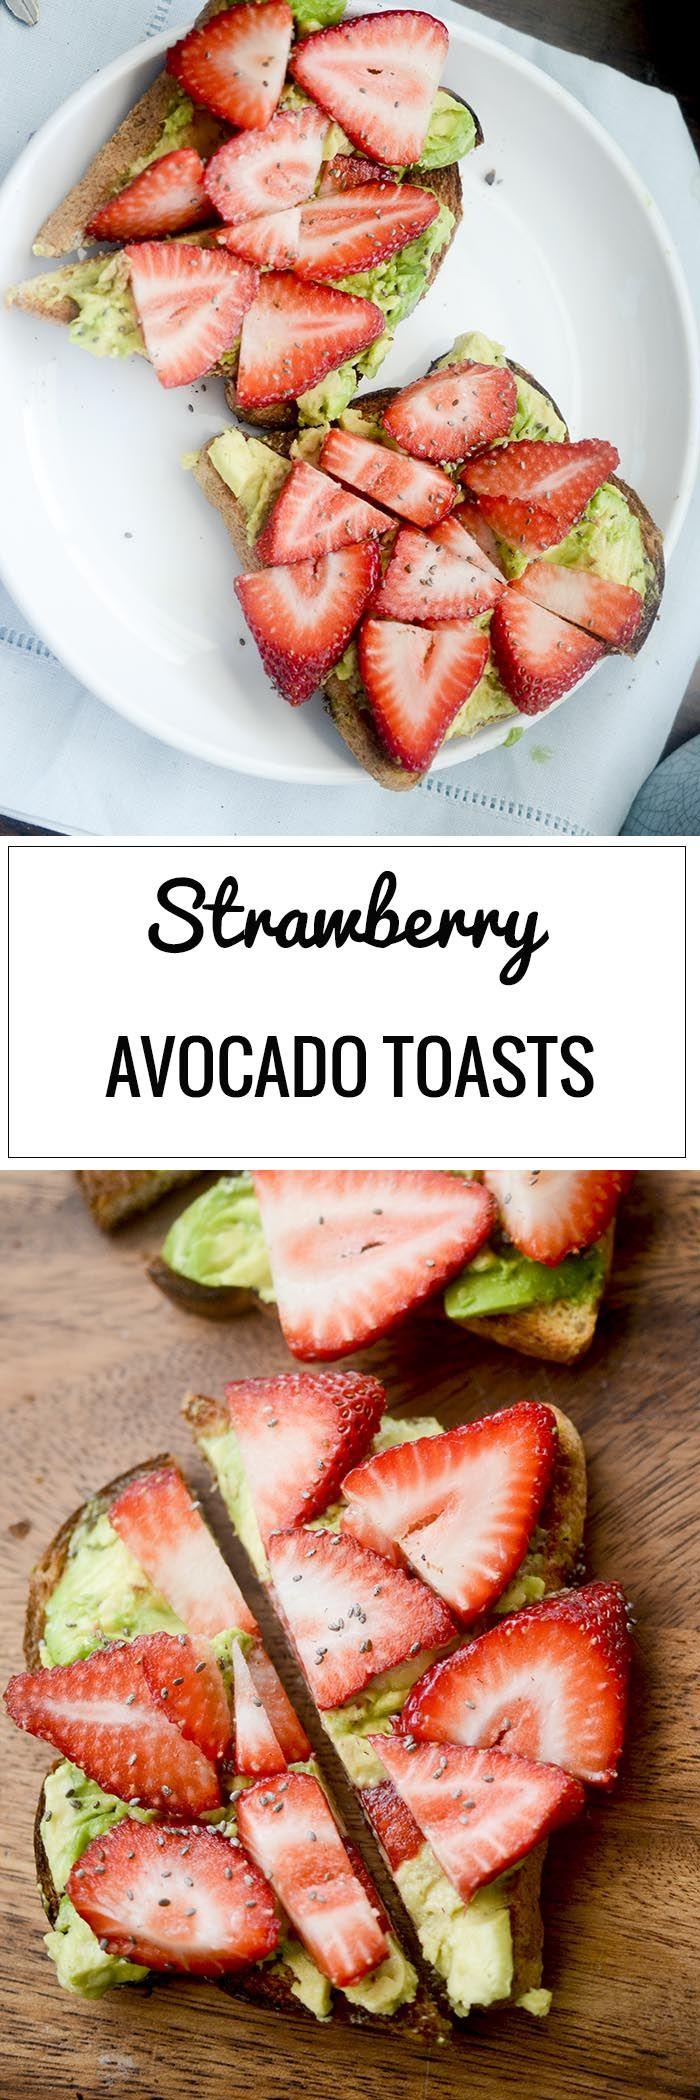 Strawberry Avocado Toasts - Recipe Diaries